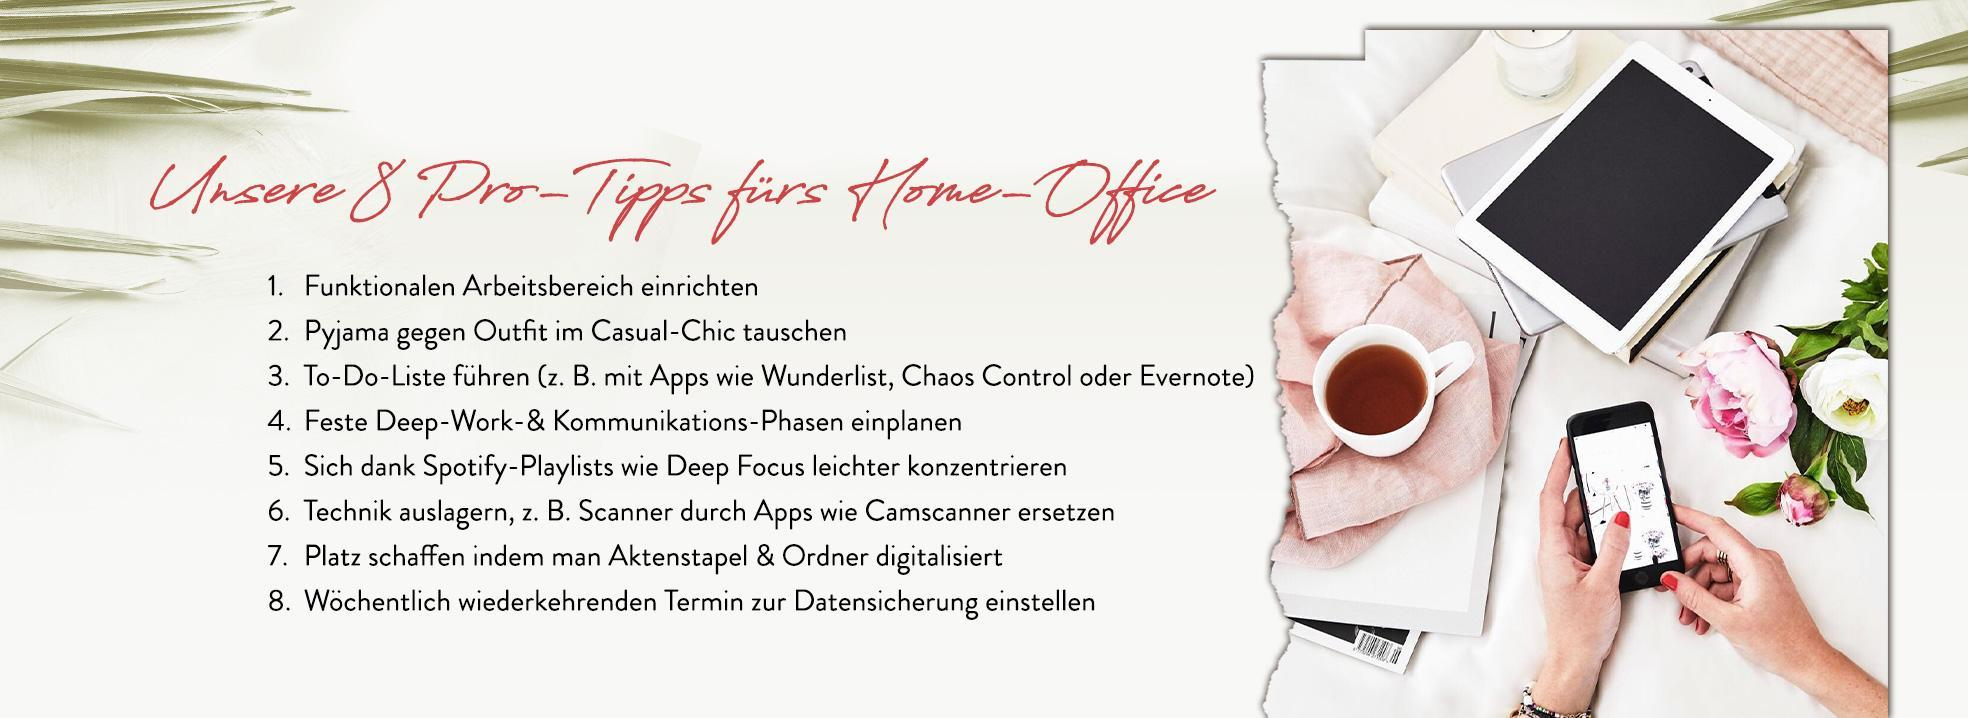 homeoffice Tipps Handy Tablet Kaffee Blumen